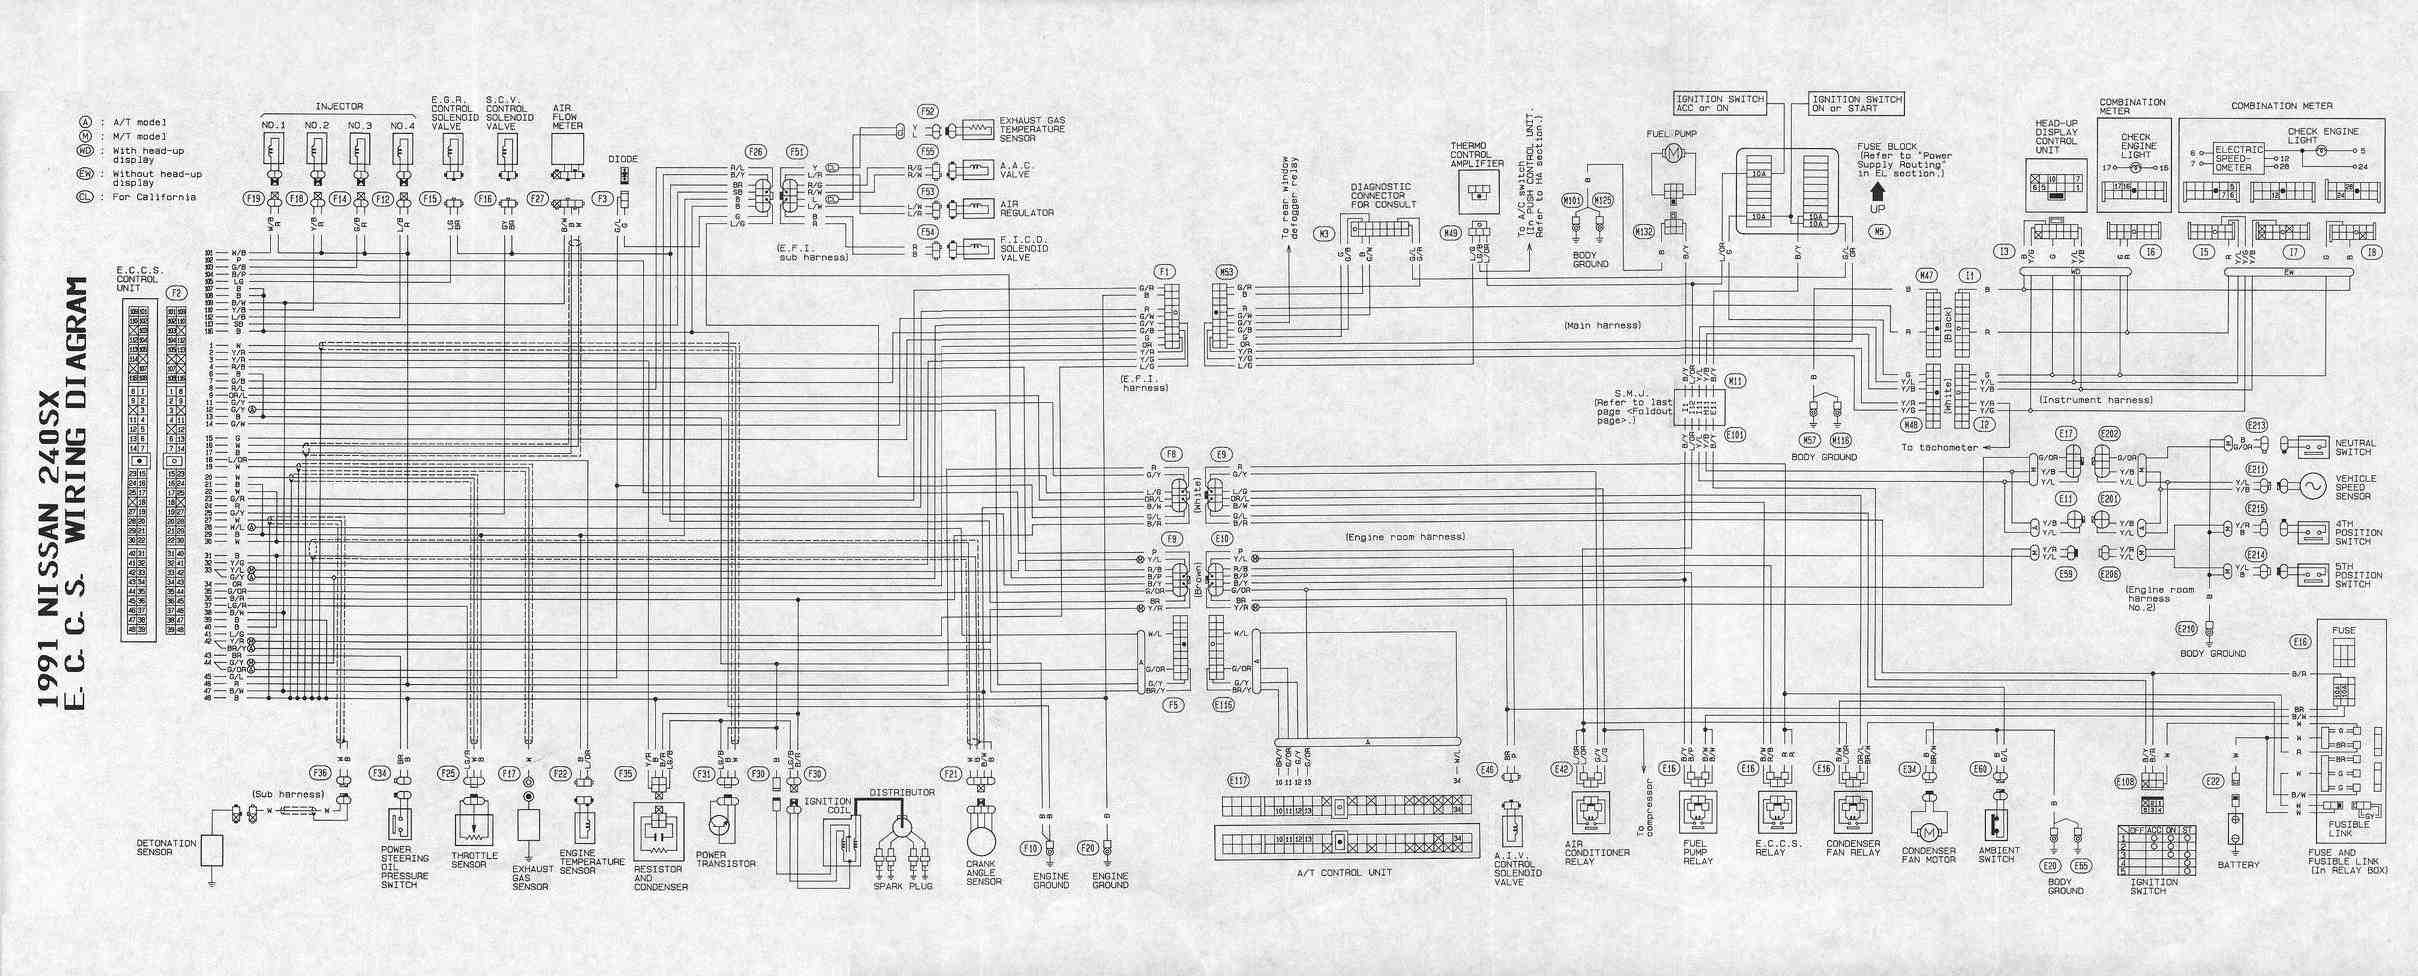 Breathtaking P05064173ak Wiring-diagram Photos - Best Image Wiring ...